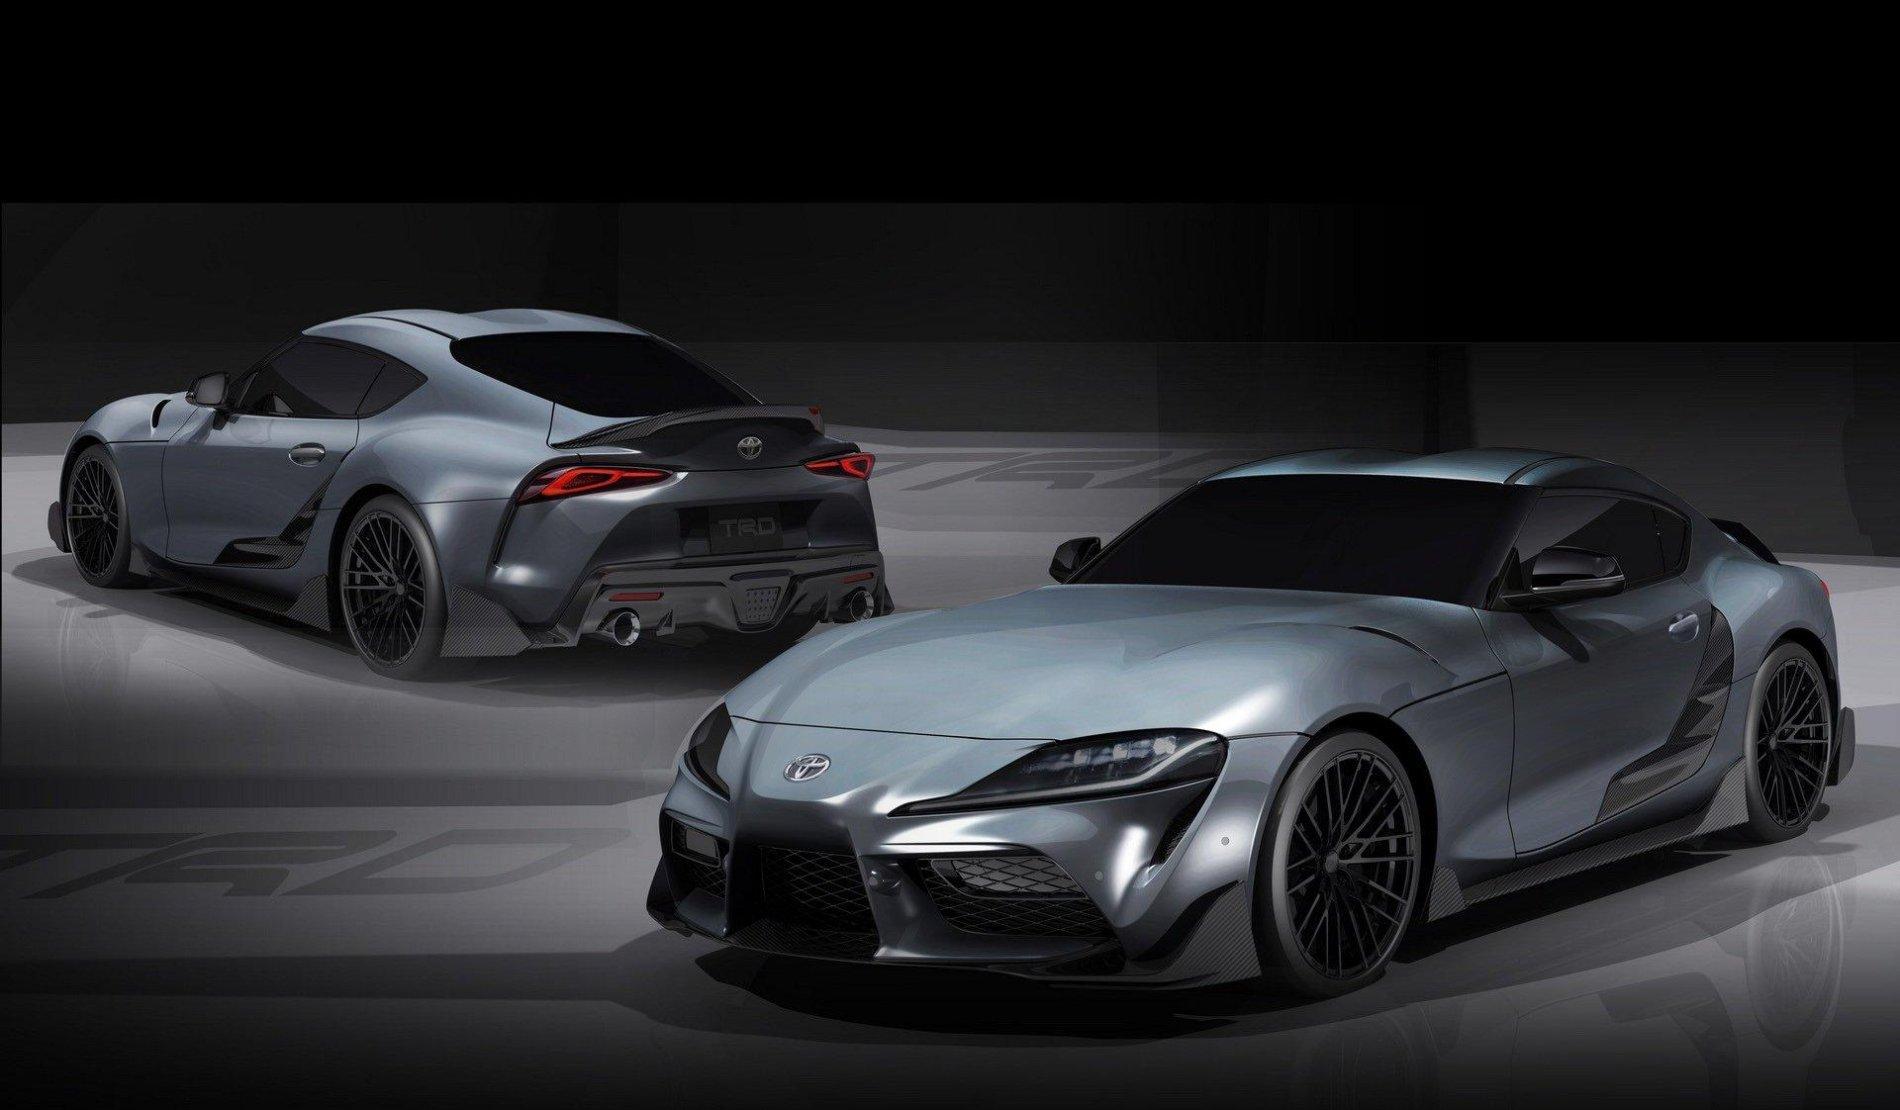 Toyota Supra TRD Performance Line - Toyota Supra TRD Performance Line